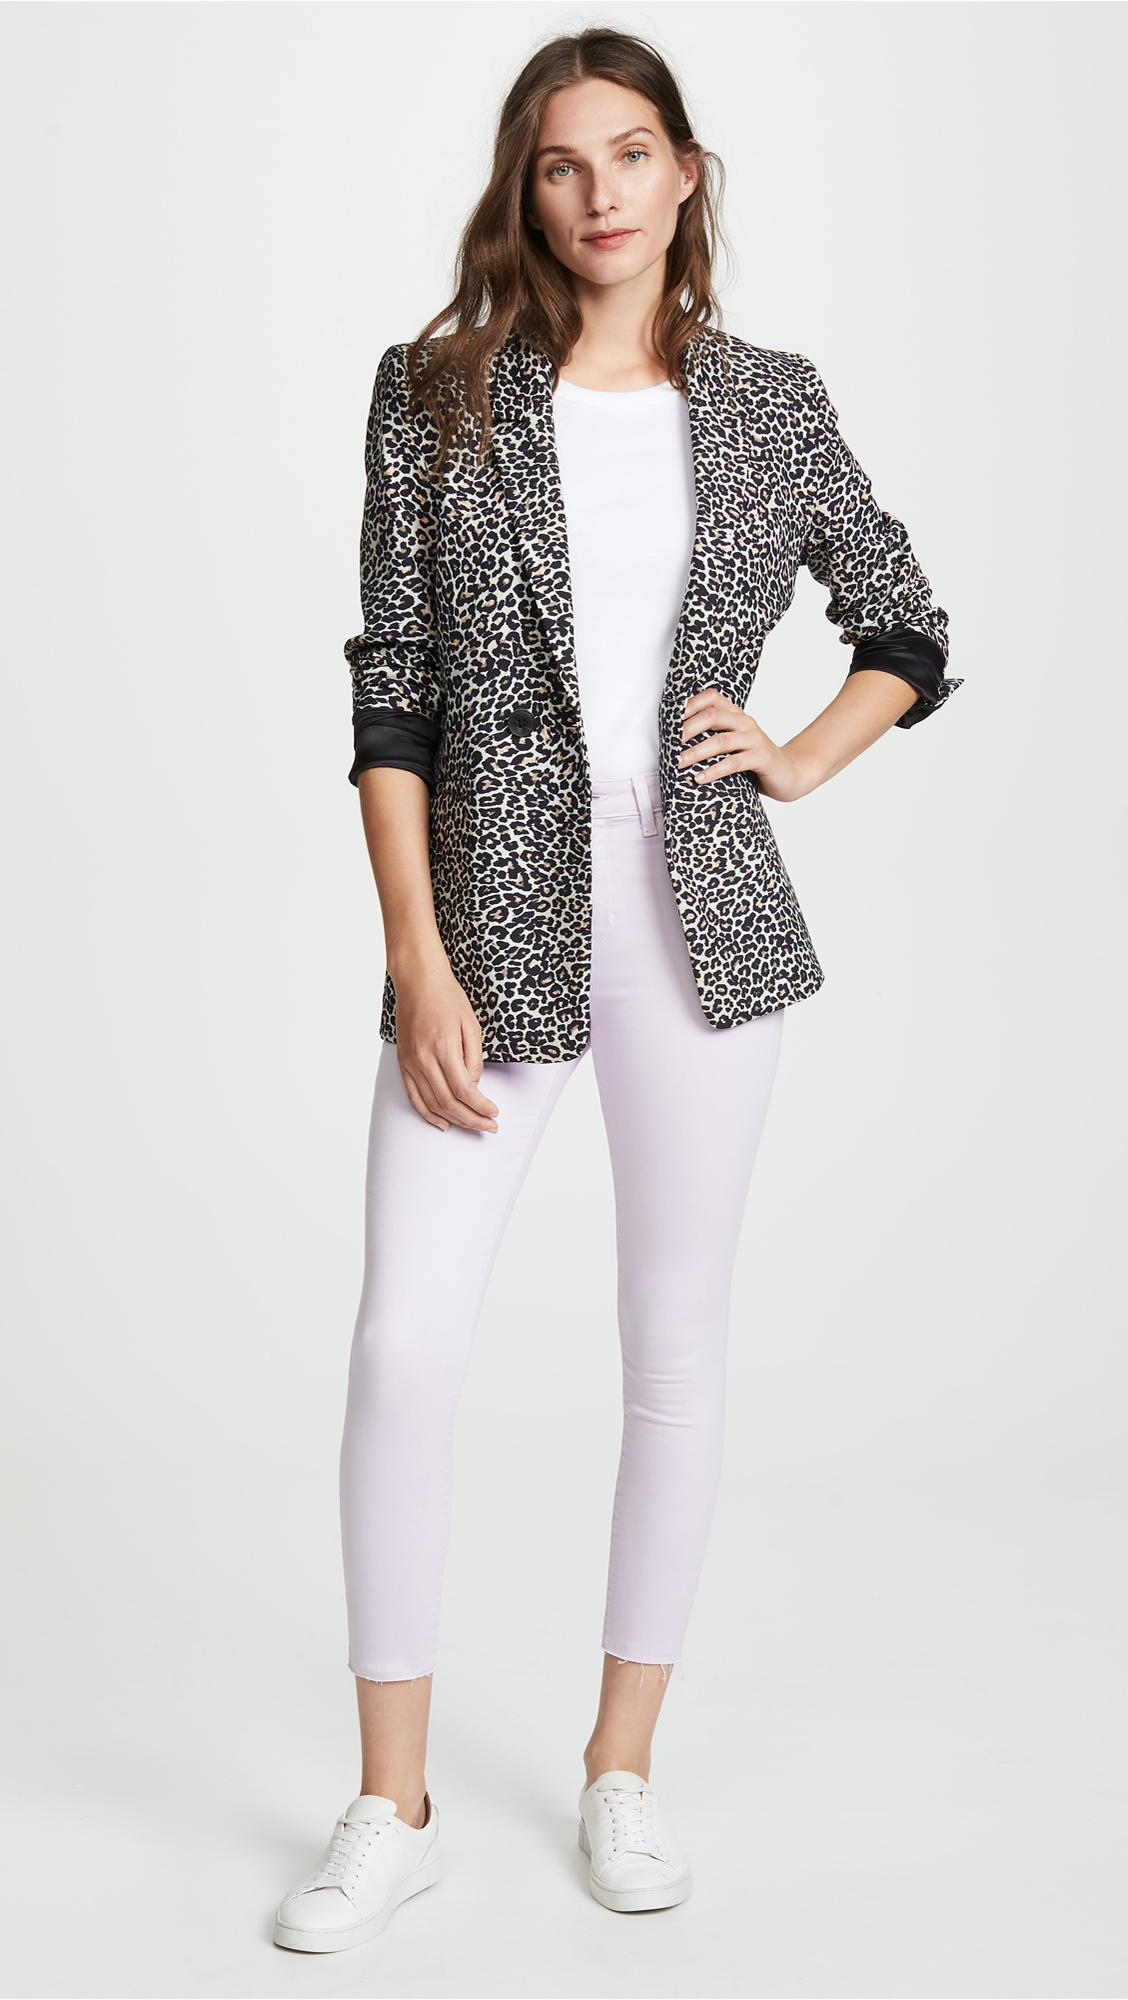 L'Agence Denim Margot High Rise Skinny Jeans